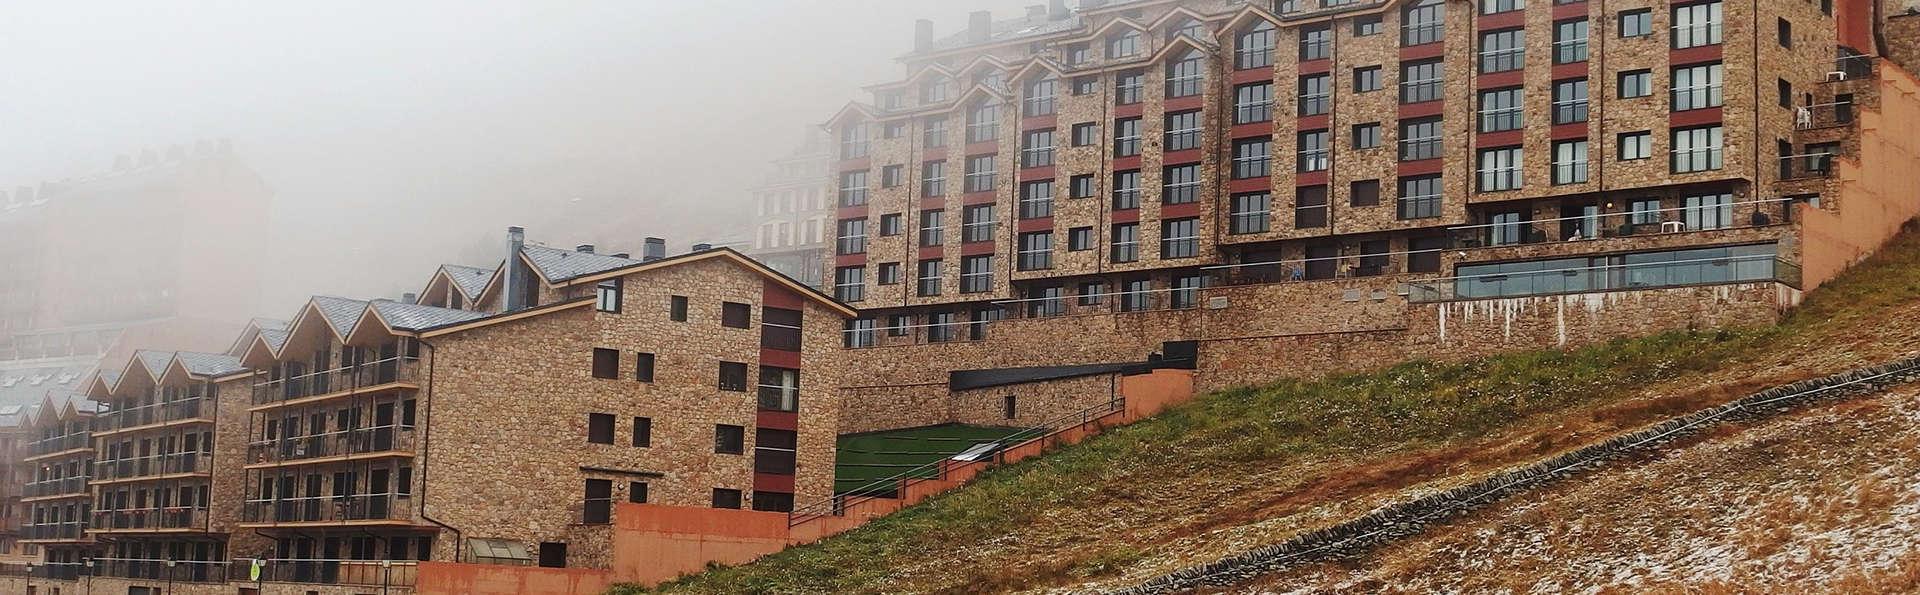 Pierre et Vacances Andorra Bordes d'Envalira - Edit_Front.jpg